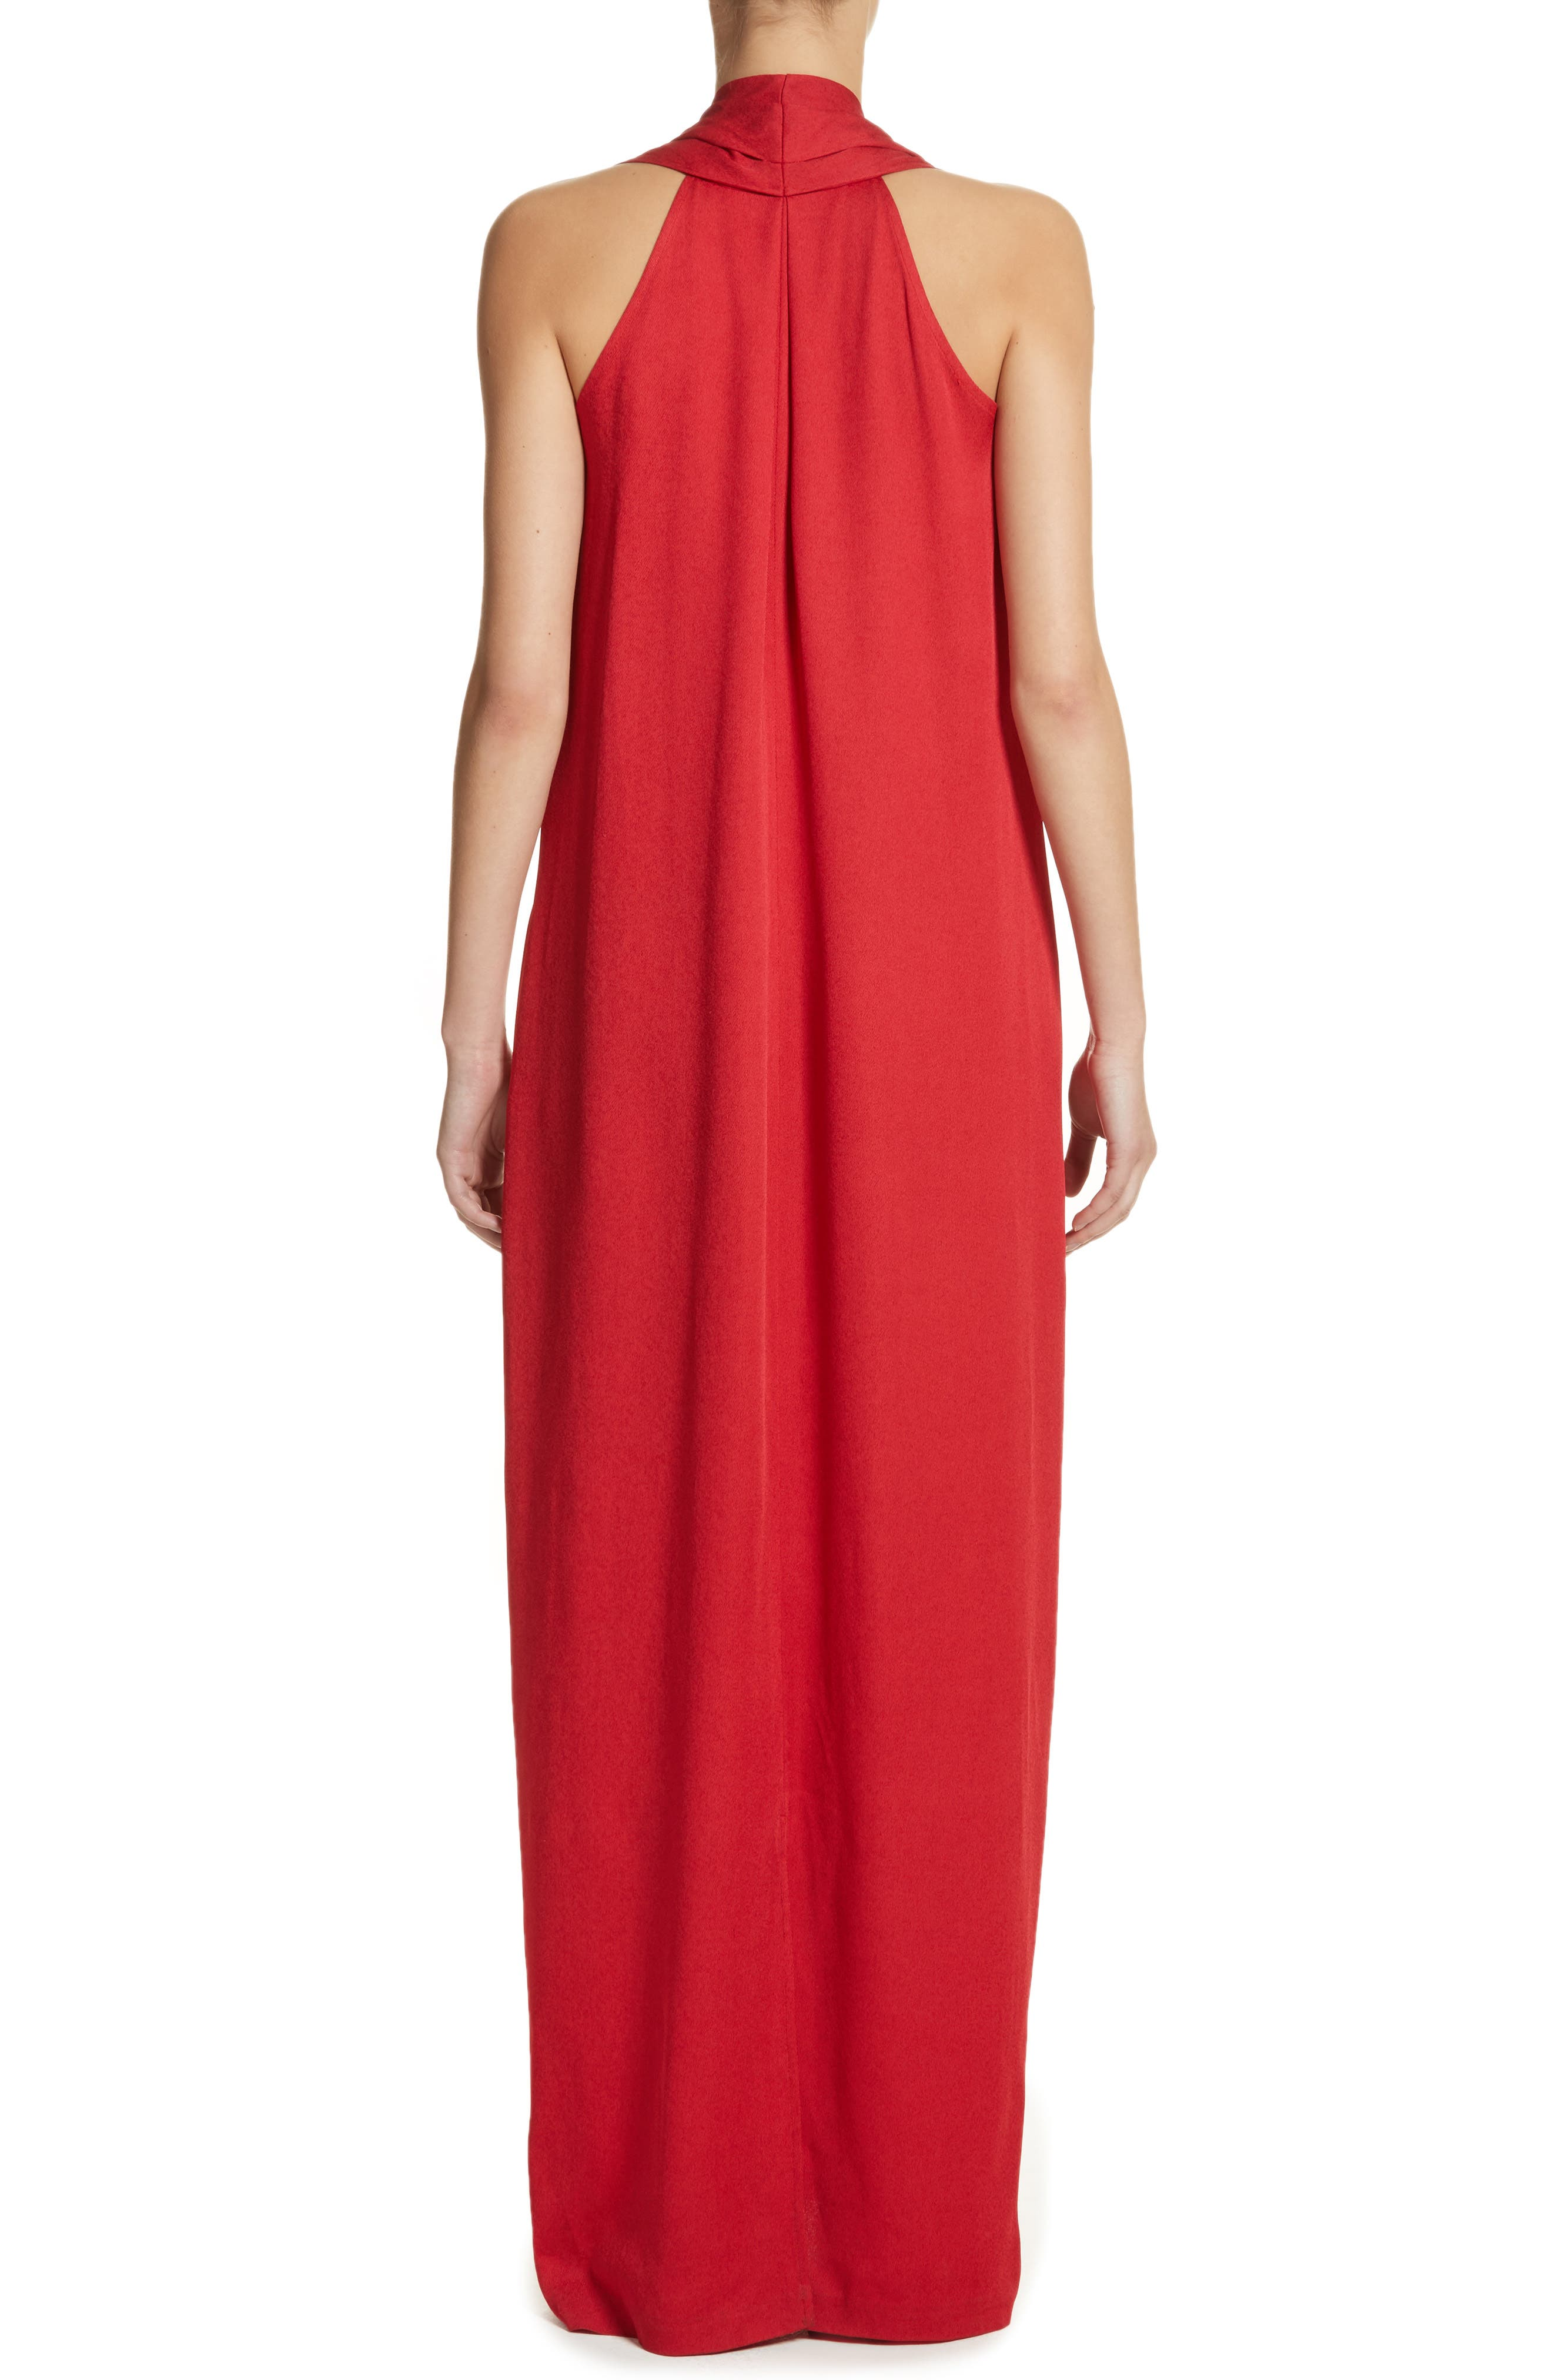 Eco Gathered Maxi Dress,                             Alternate thumbnail 2, color,                             Poppy